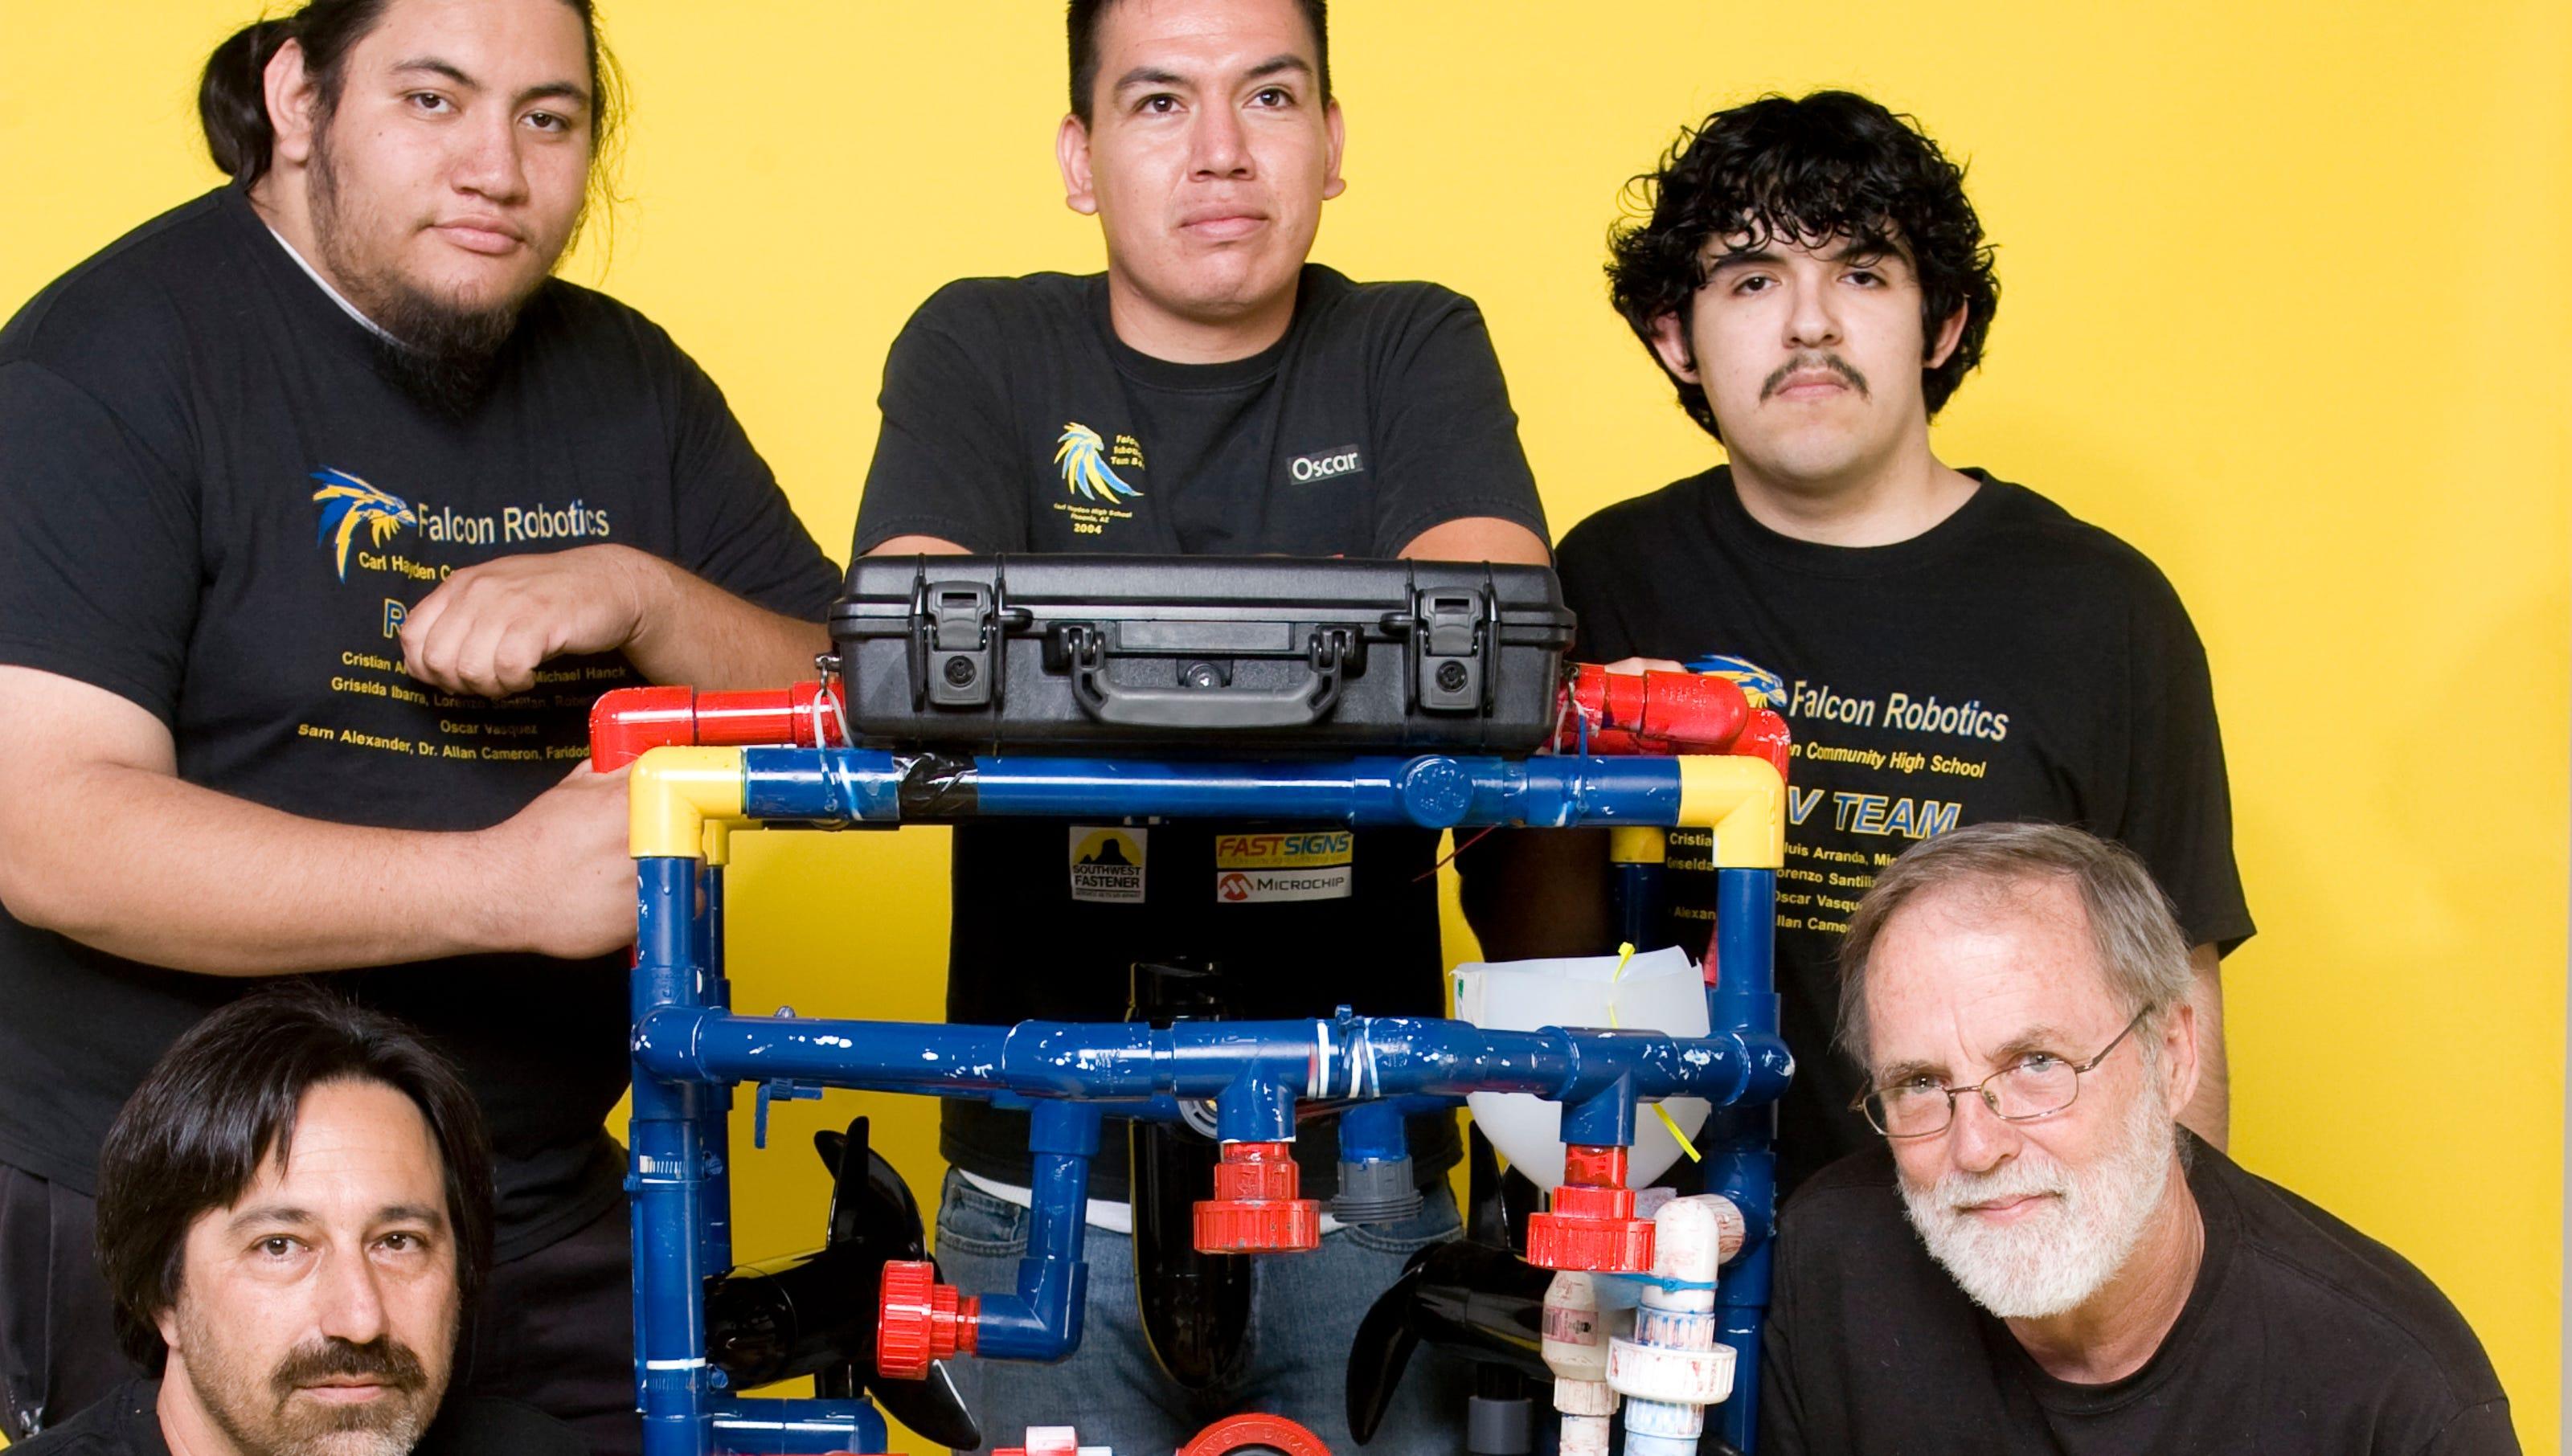 Hispanic Heritage Honors Aguilar Hayden Robotics Team